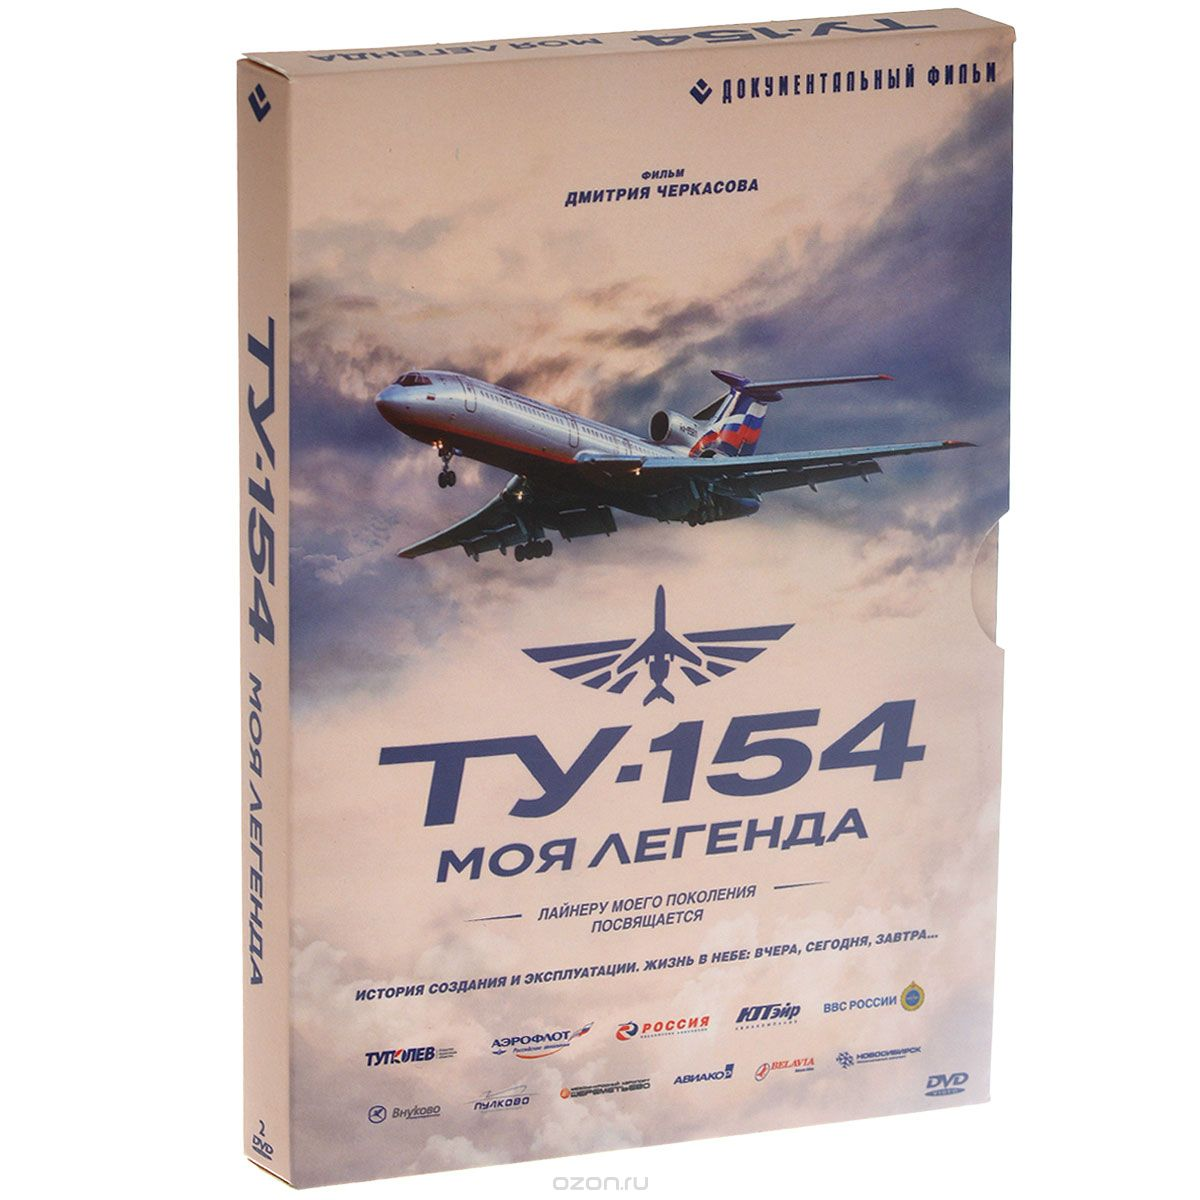 Ту-154: Моя легенда